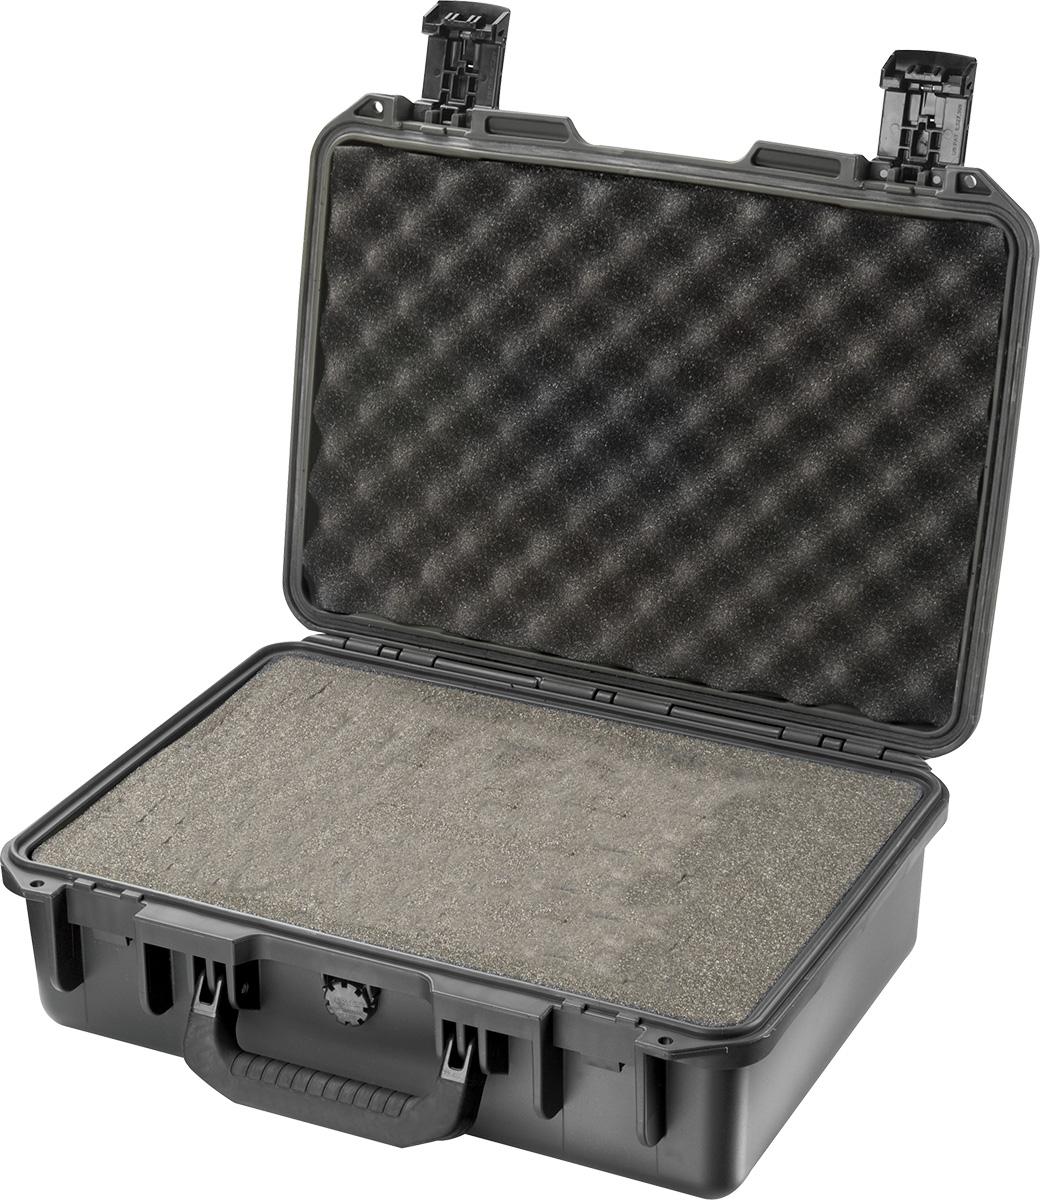 im2300 storm hard case carrying cases pelican professional. Black Bedroom Furniture Sets. Home Design Ideas